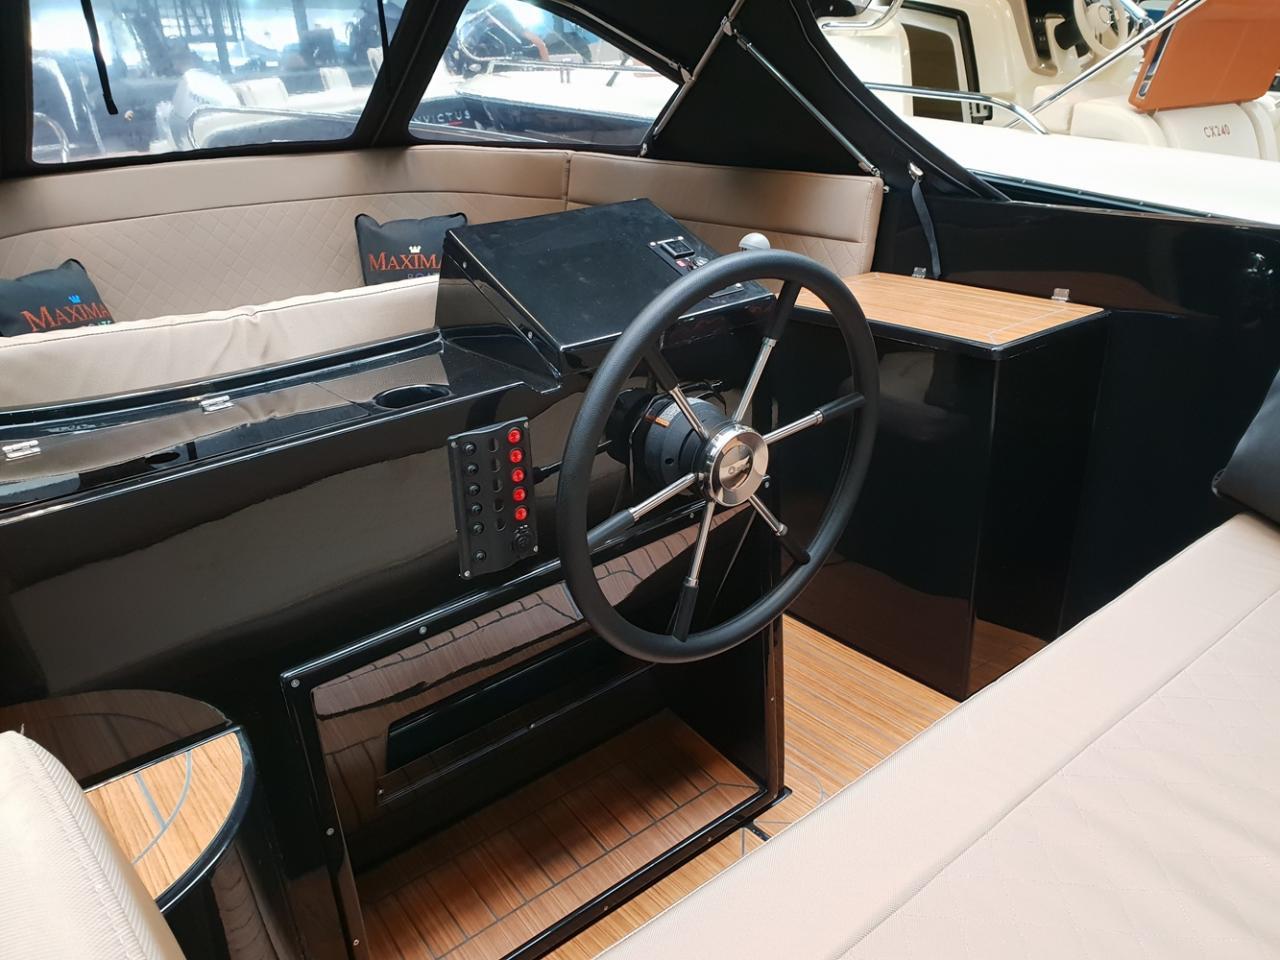 Maxima 620 Retro met Honda 50 pk 6